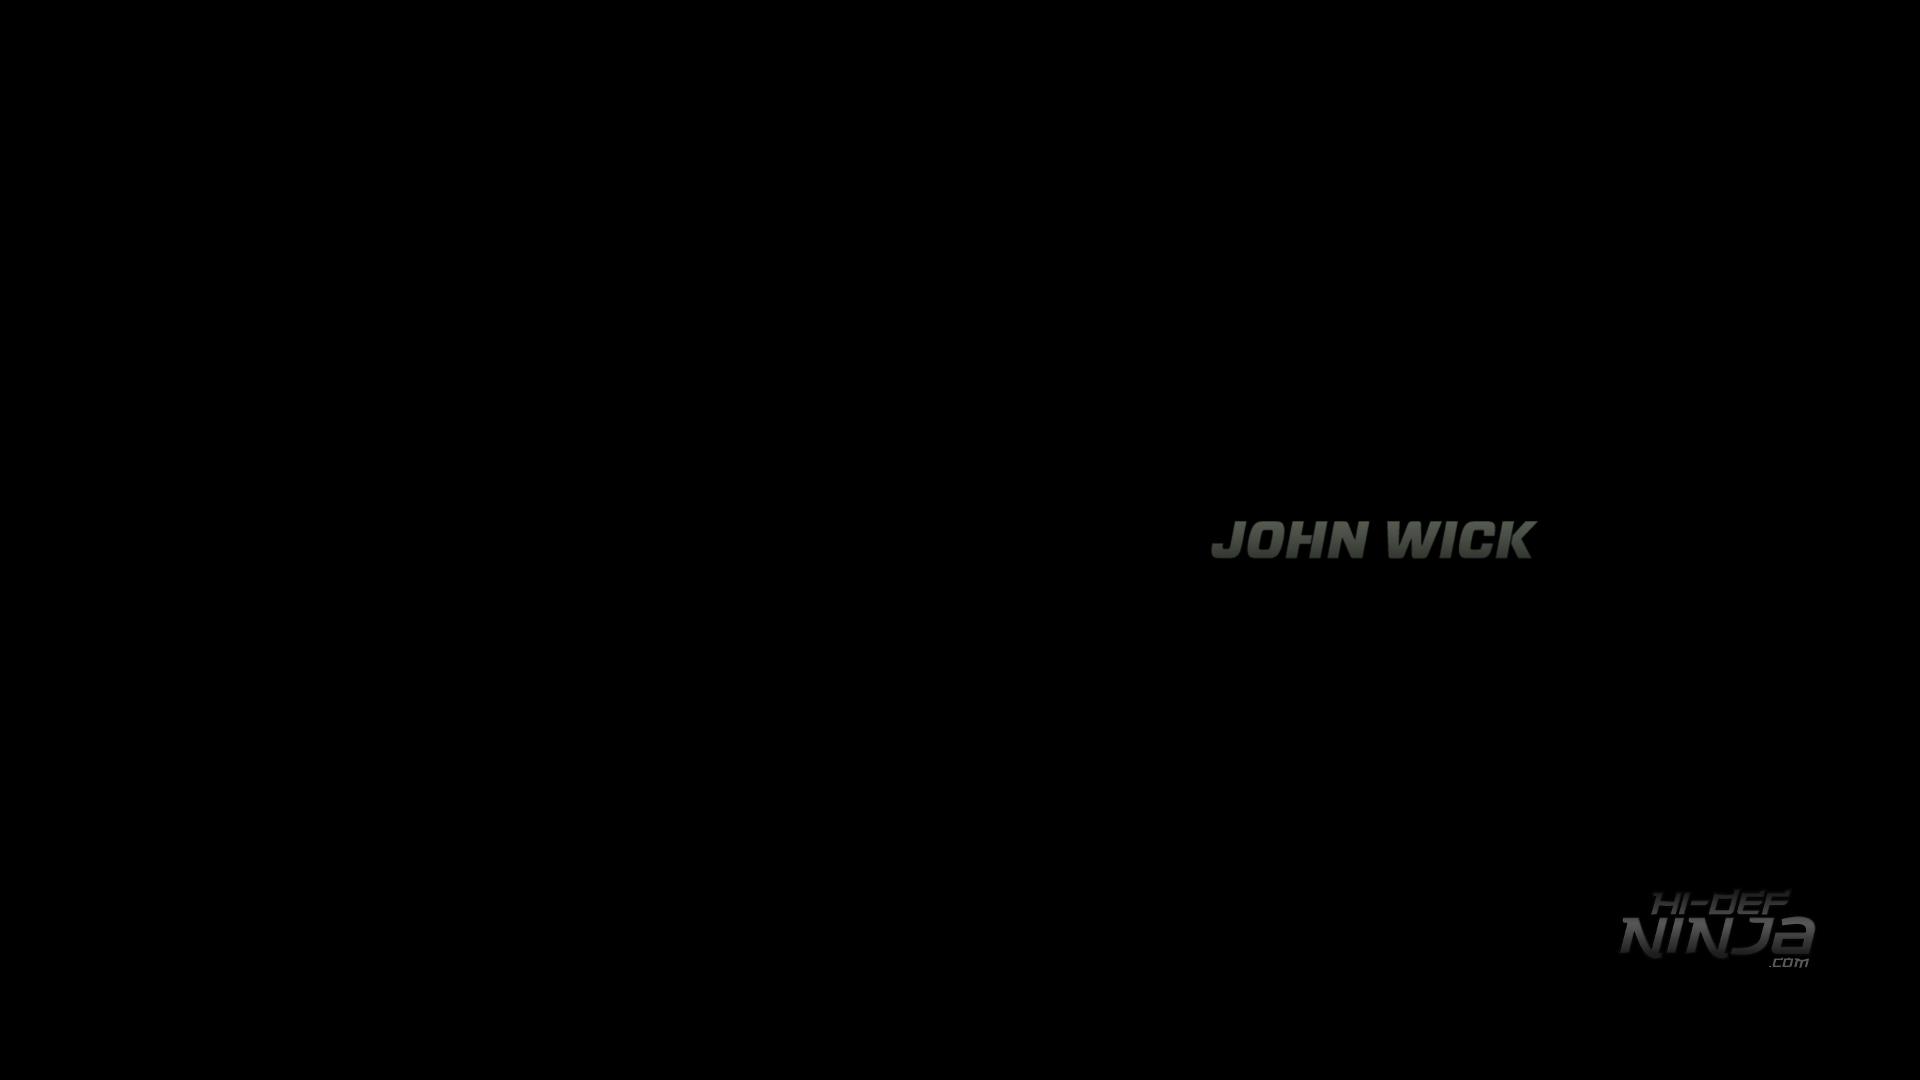 John_Wick (2)